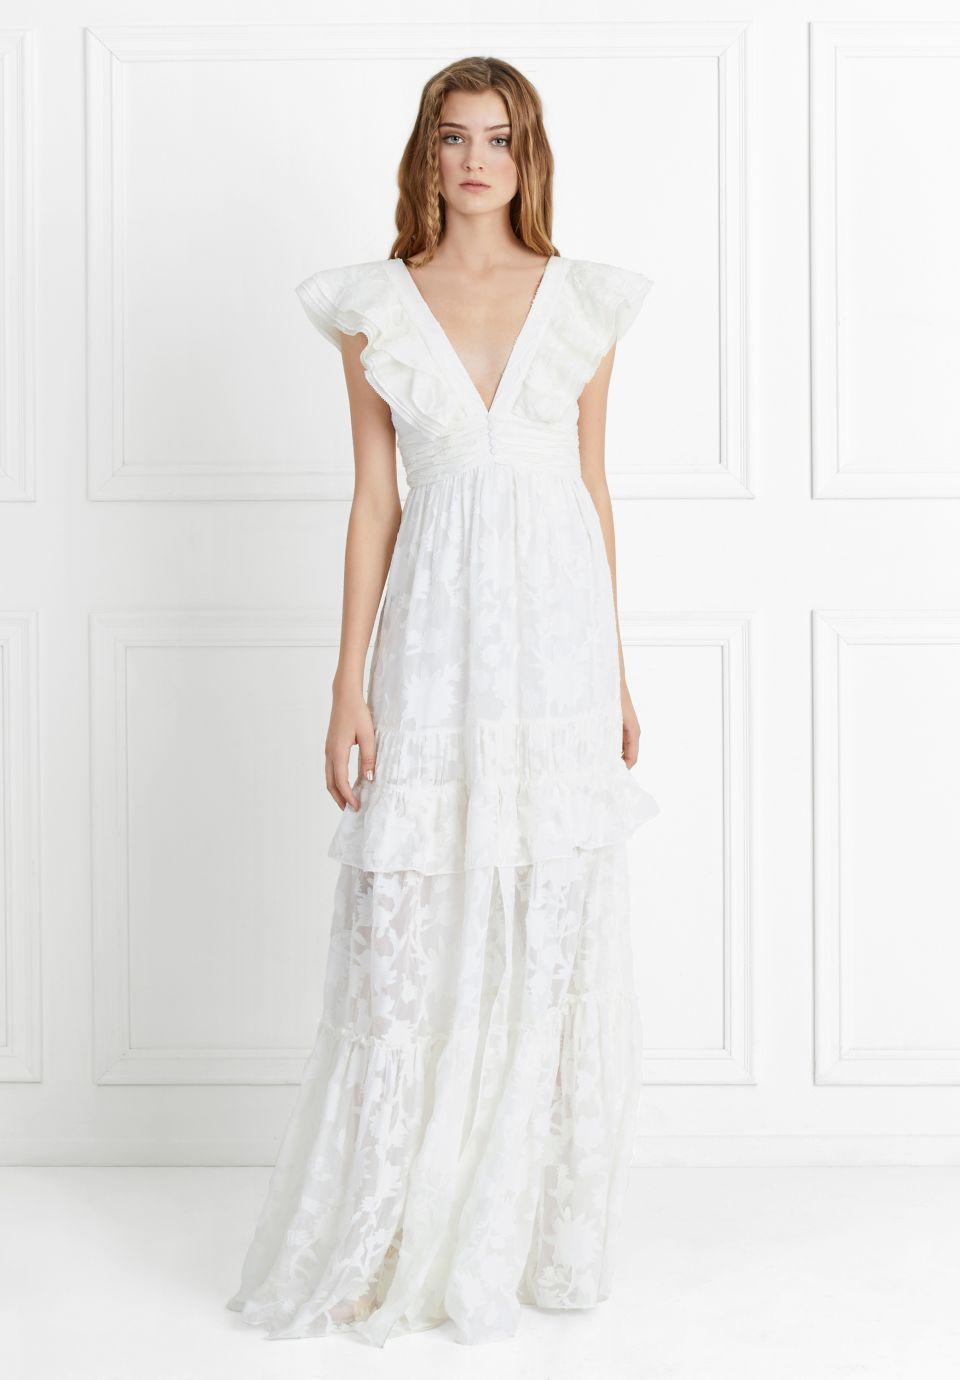 Violet fil coupe gown wedding bridal inspiration pinterest